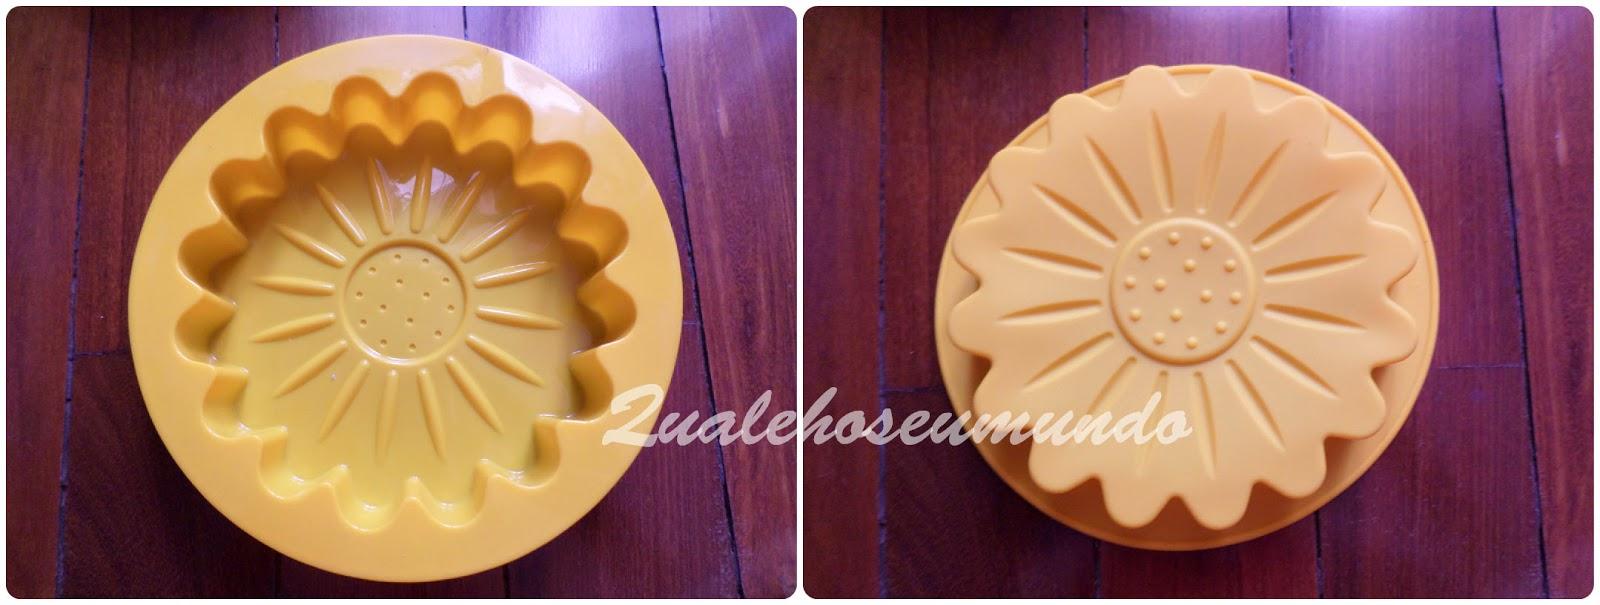 forma de silicone para bolos